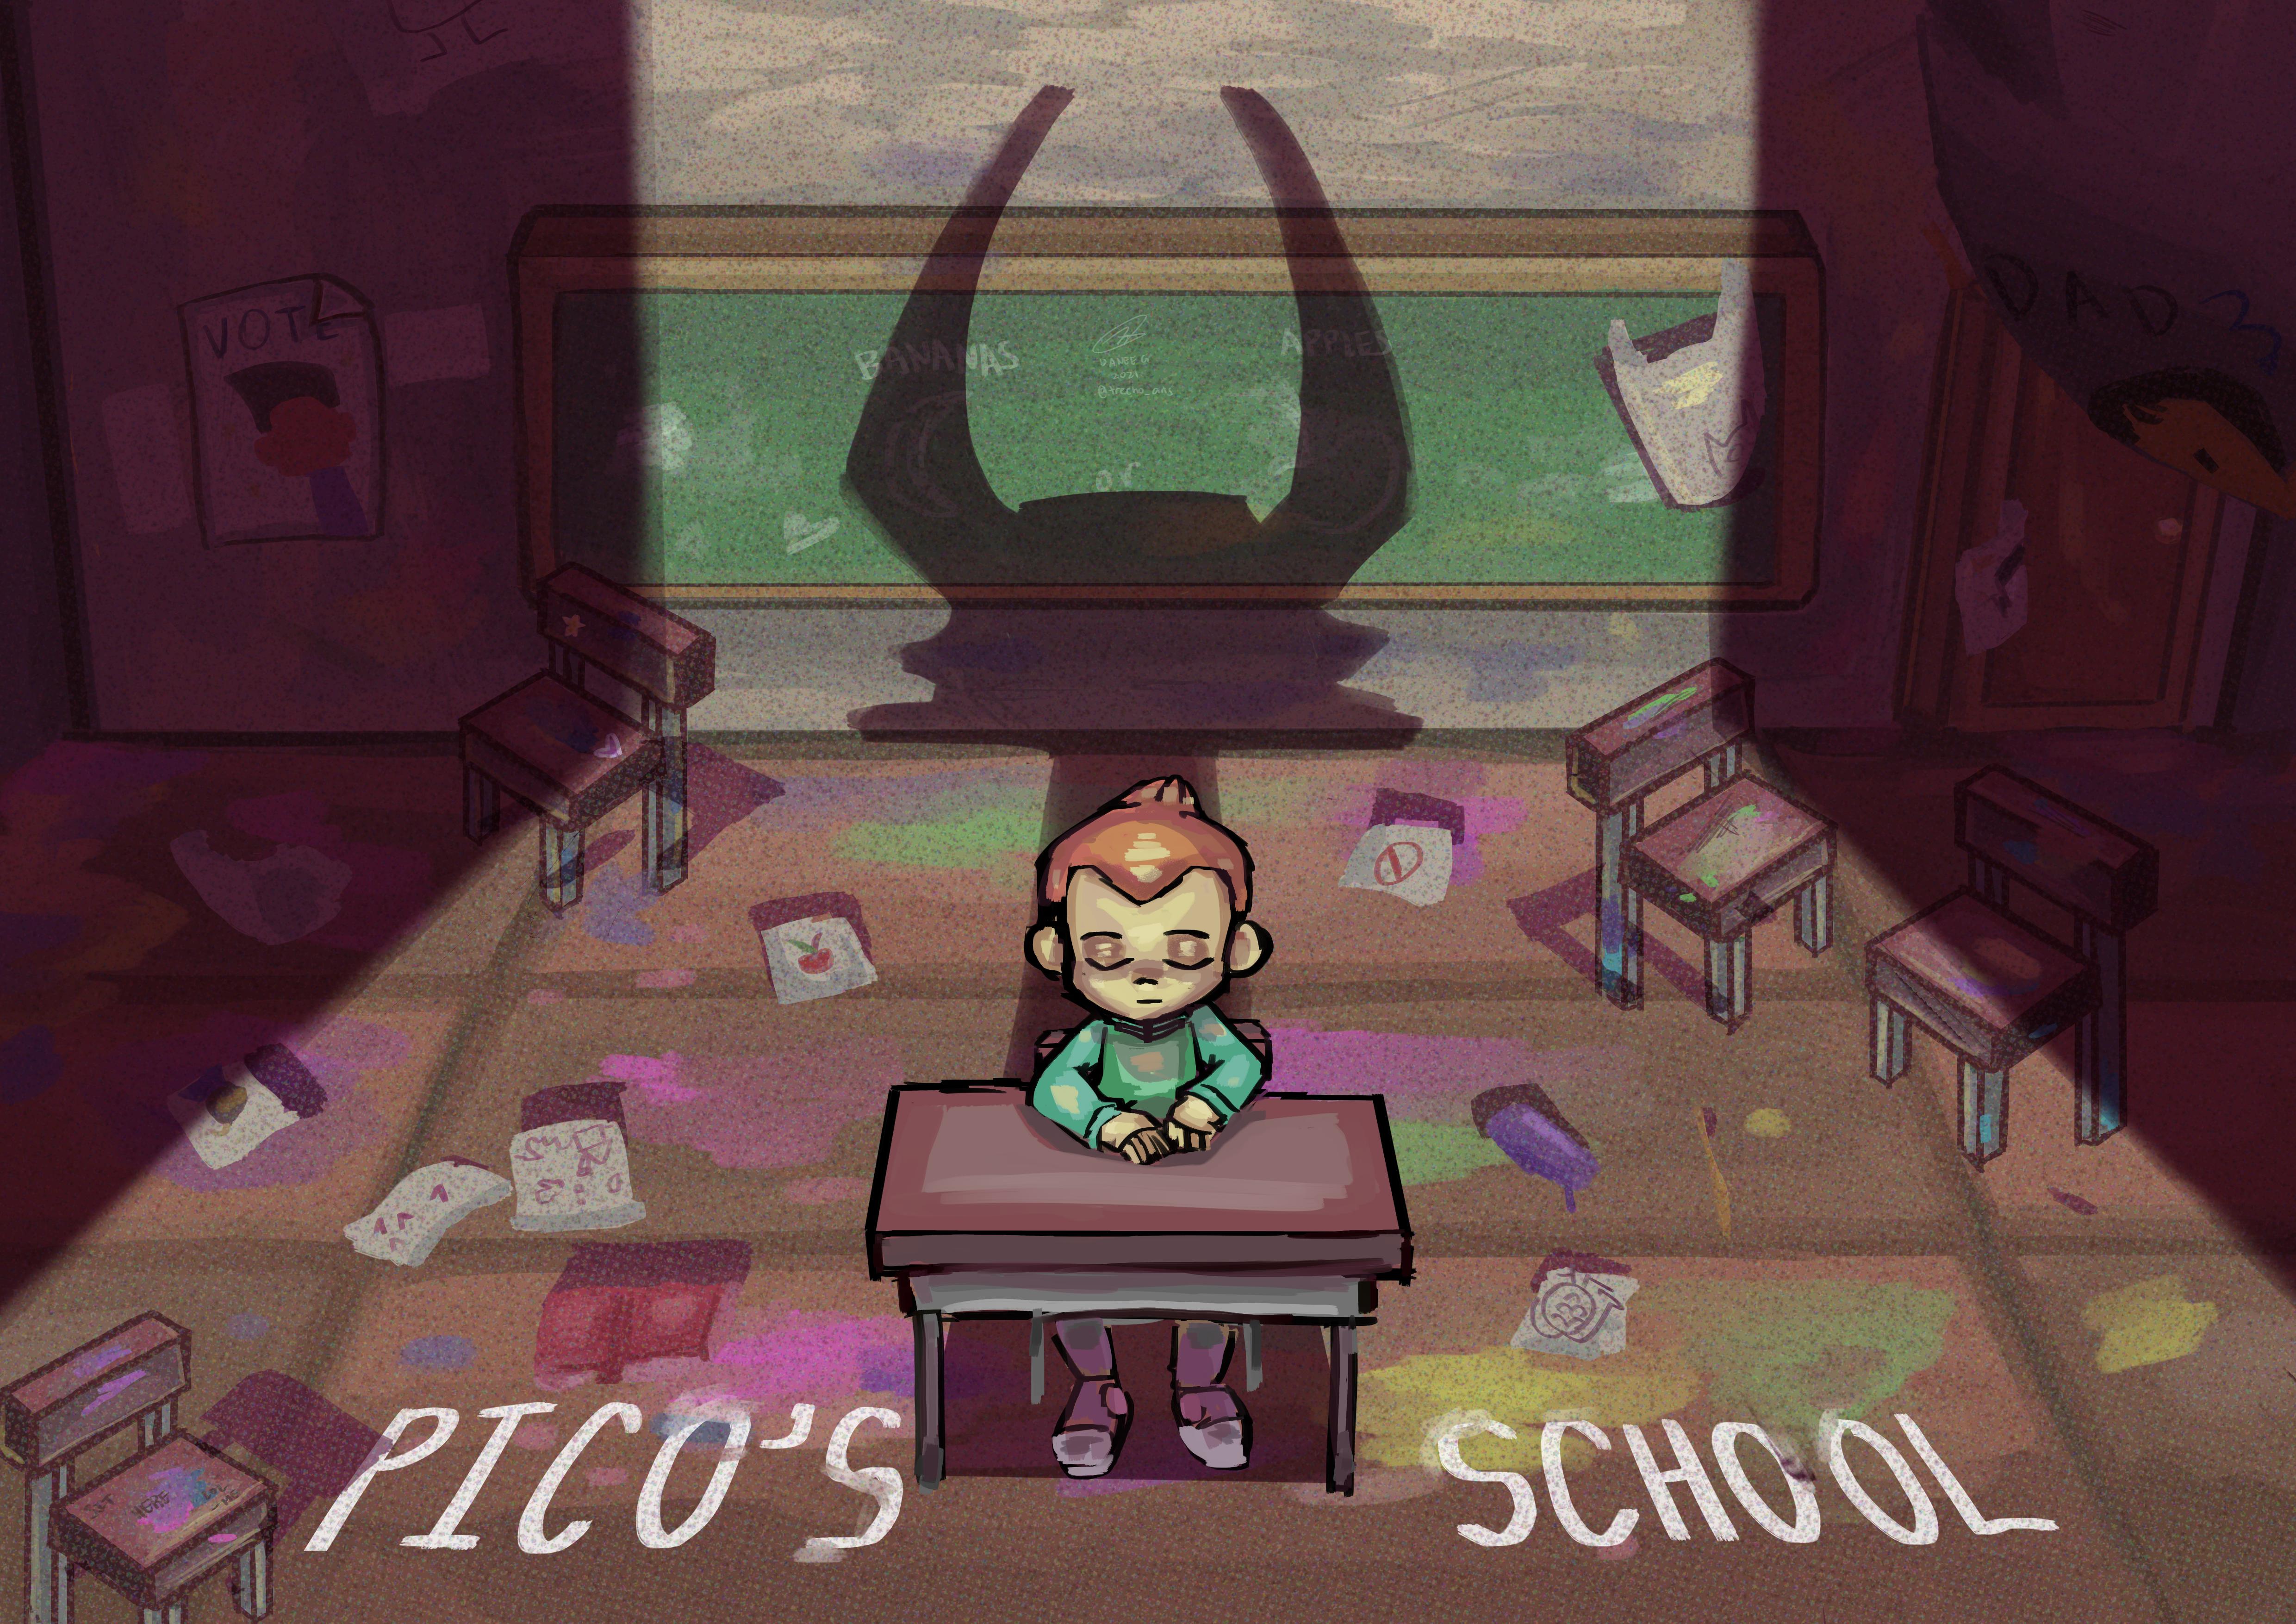 Recess is Over (Pico's School)